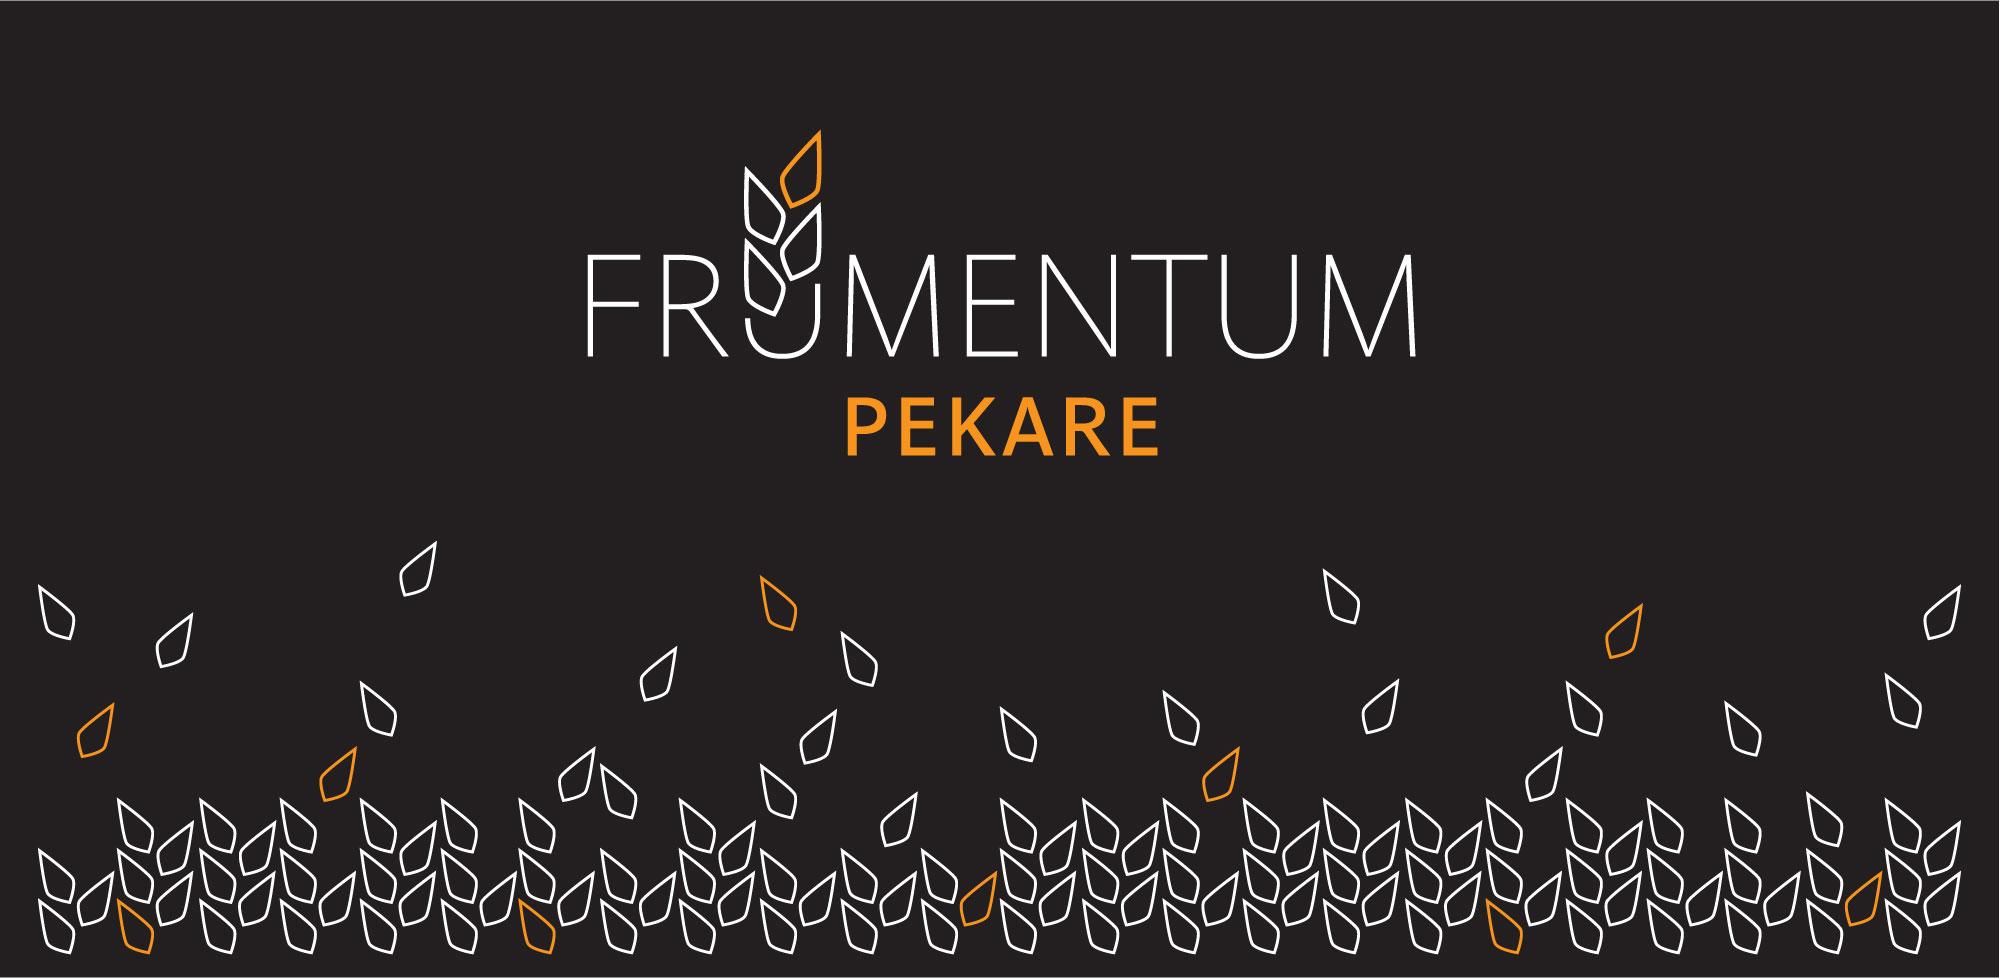 masavukmanovic.com - frumentum bakeries - branding 01